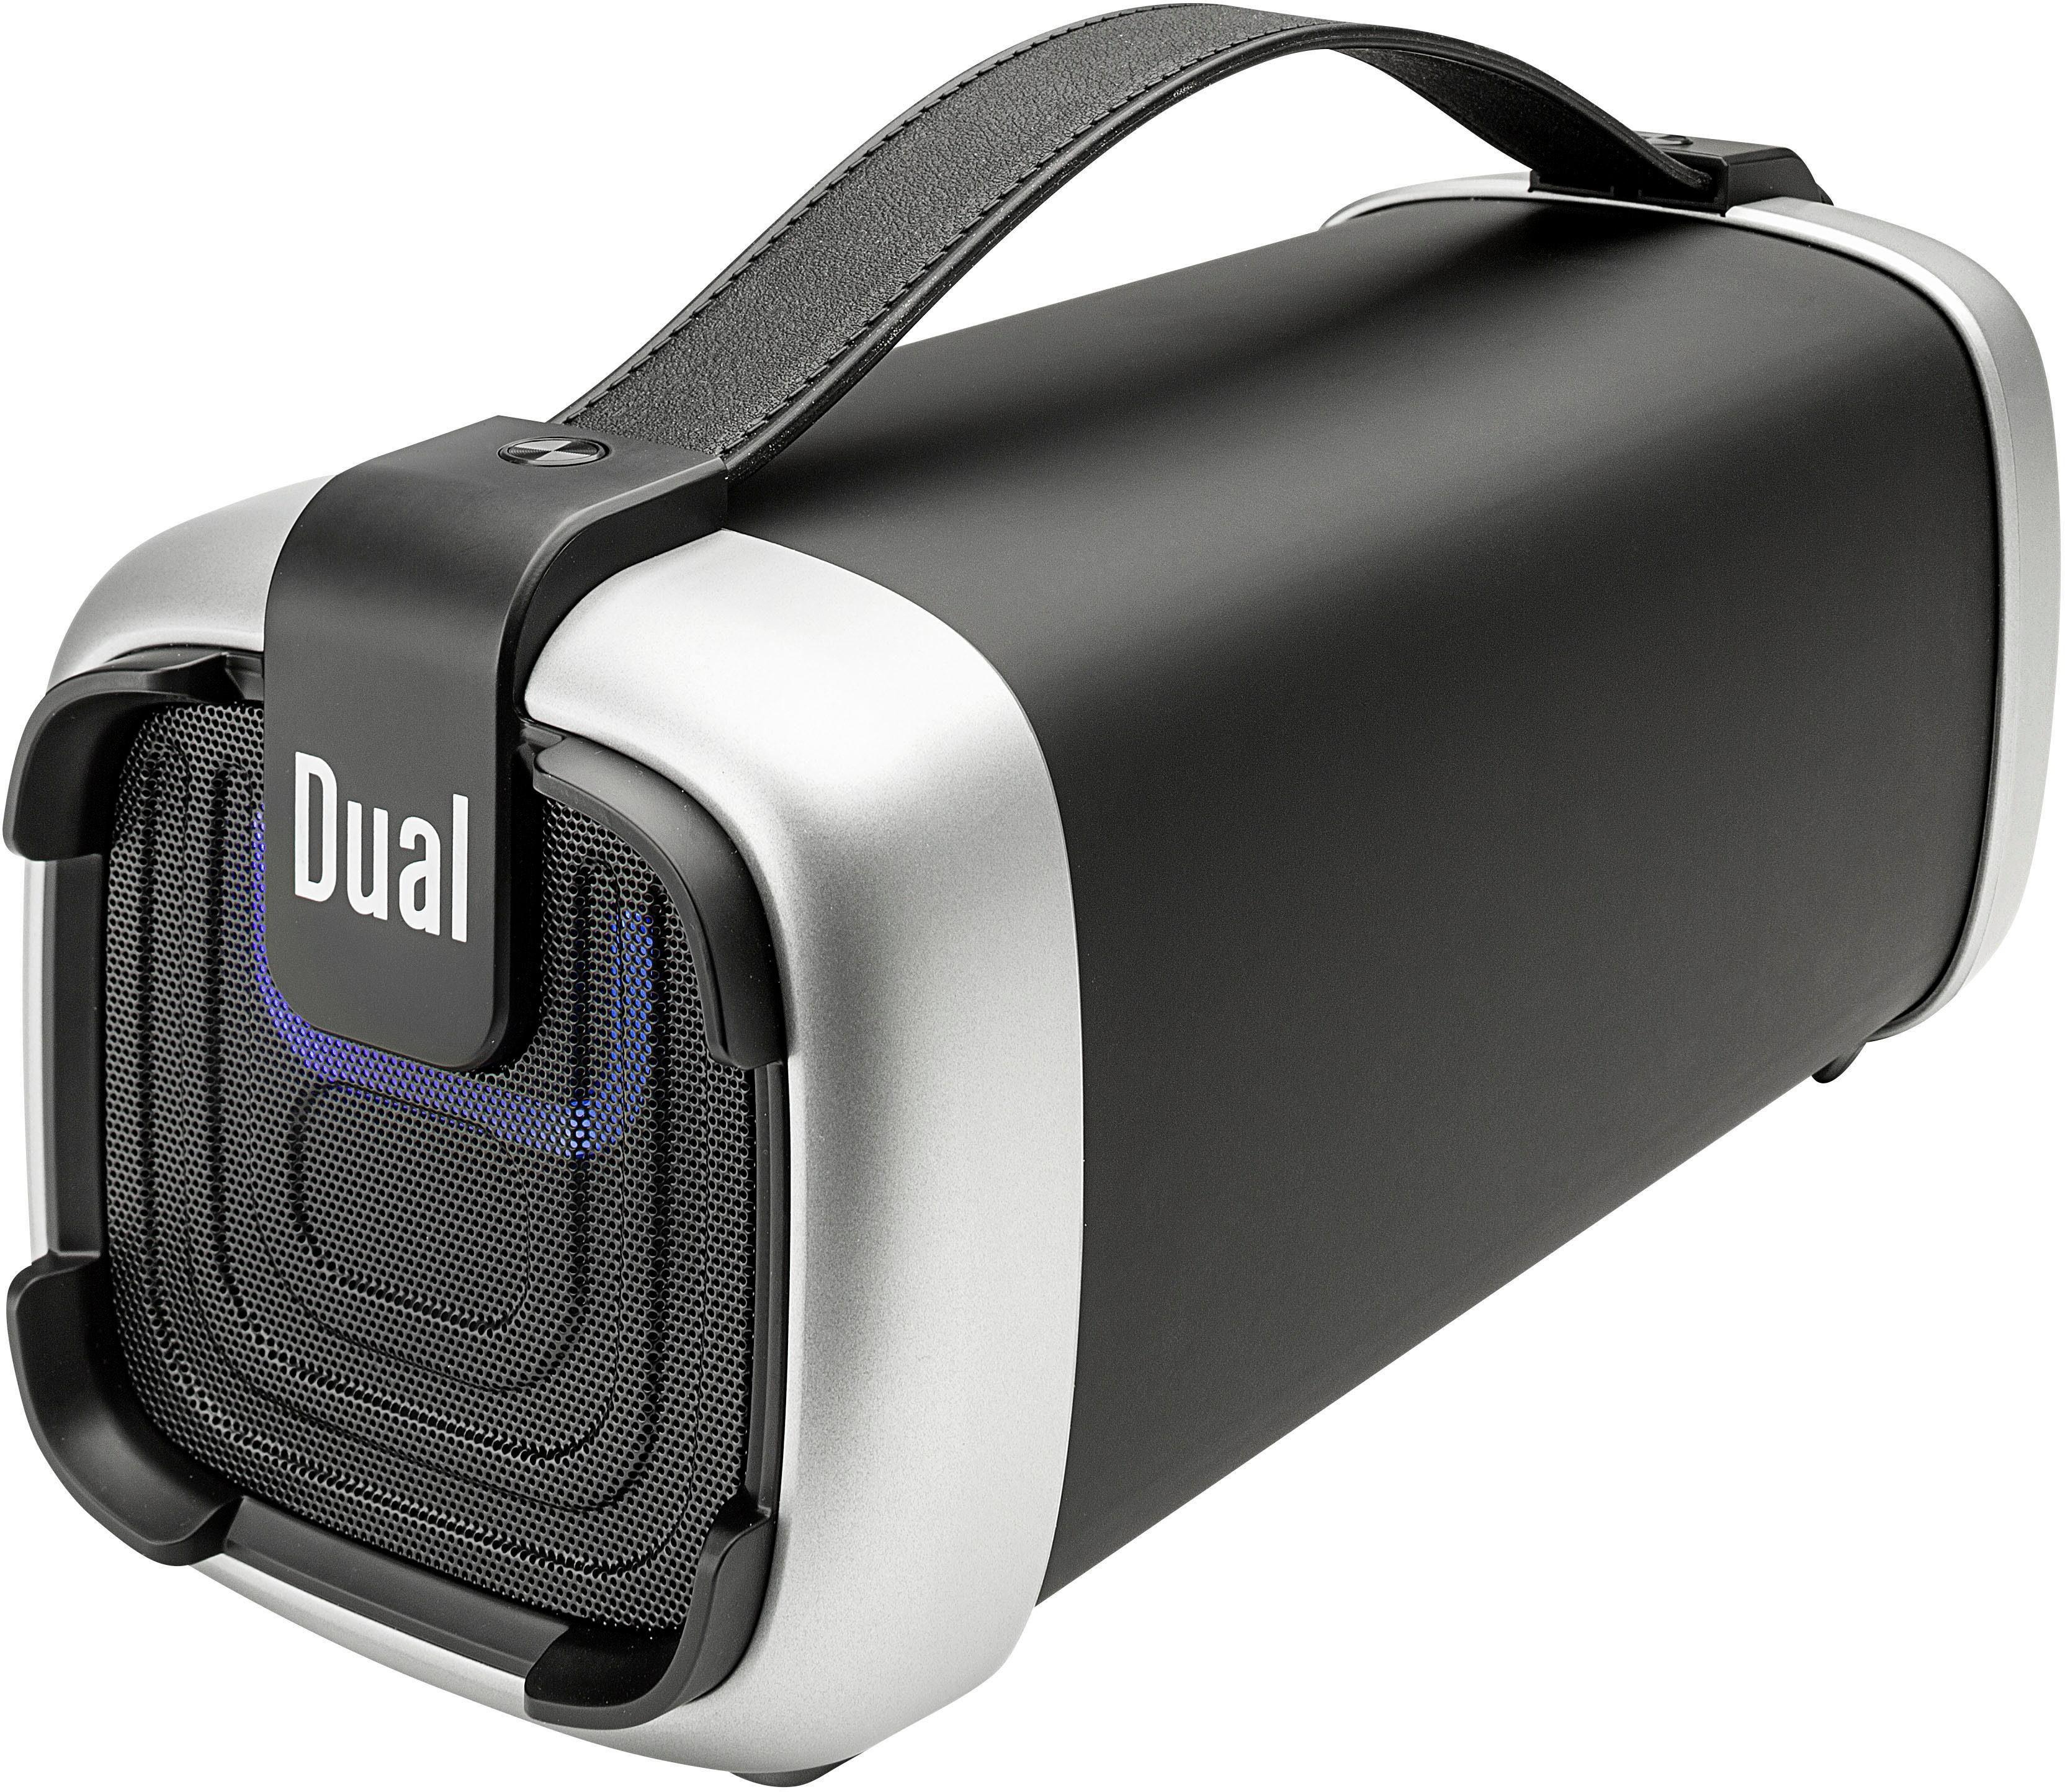 Dual BT10 2.1 Portable-Lautsprecher (Bluetooth, 13 W)